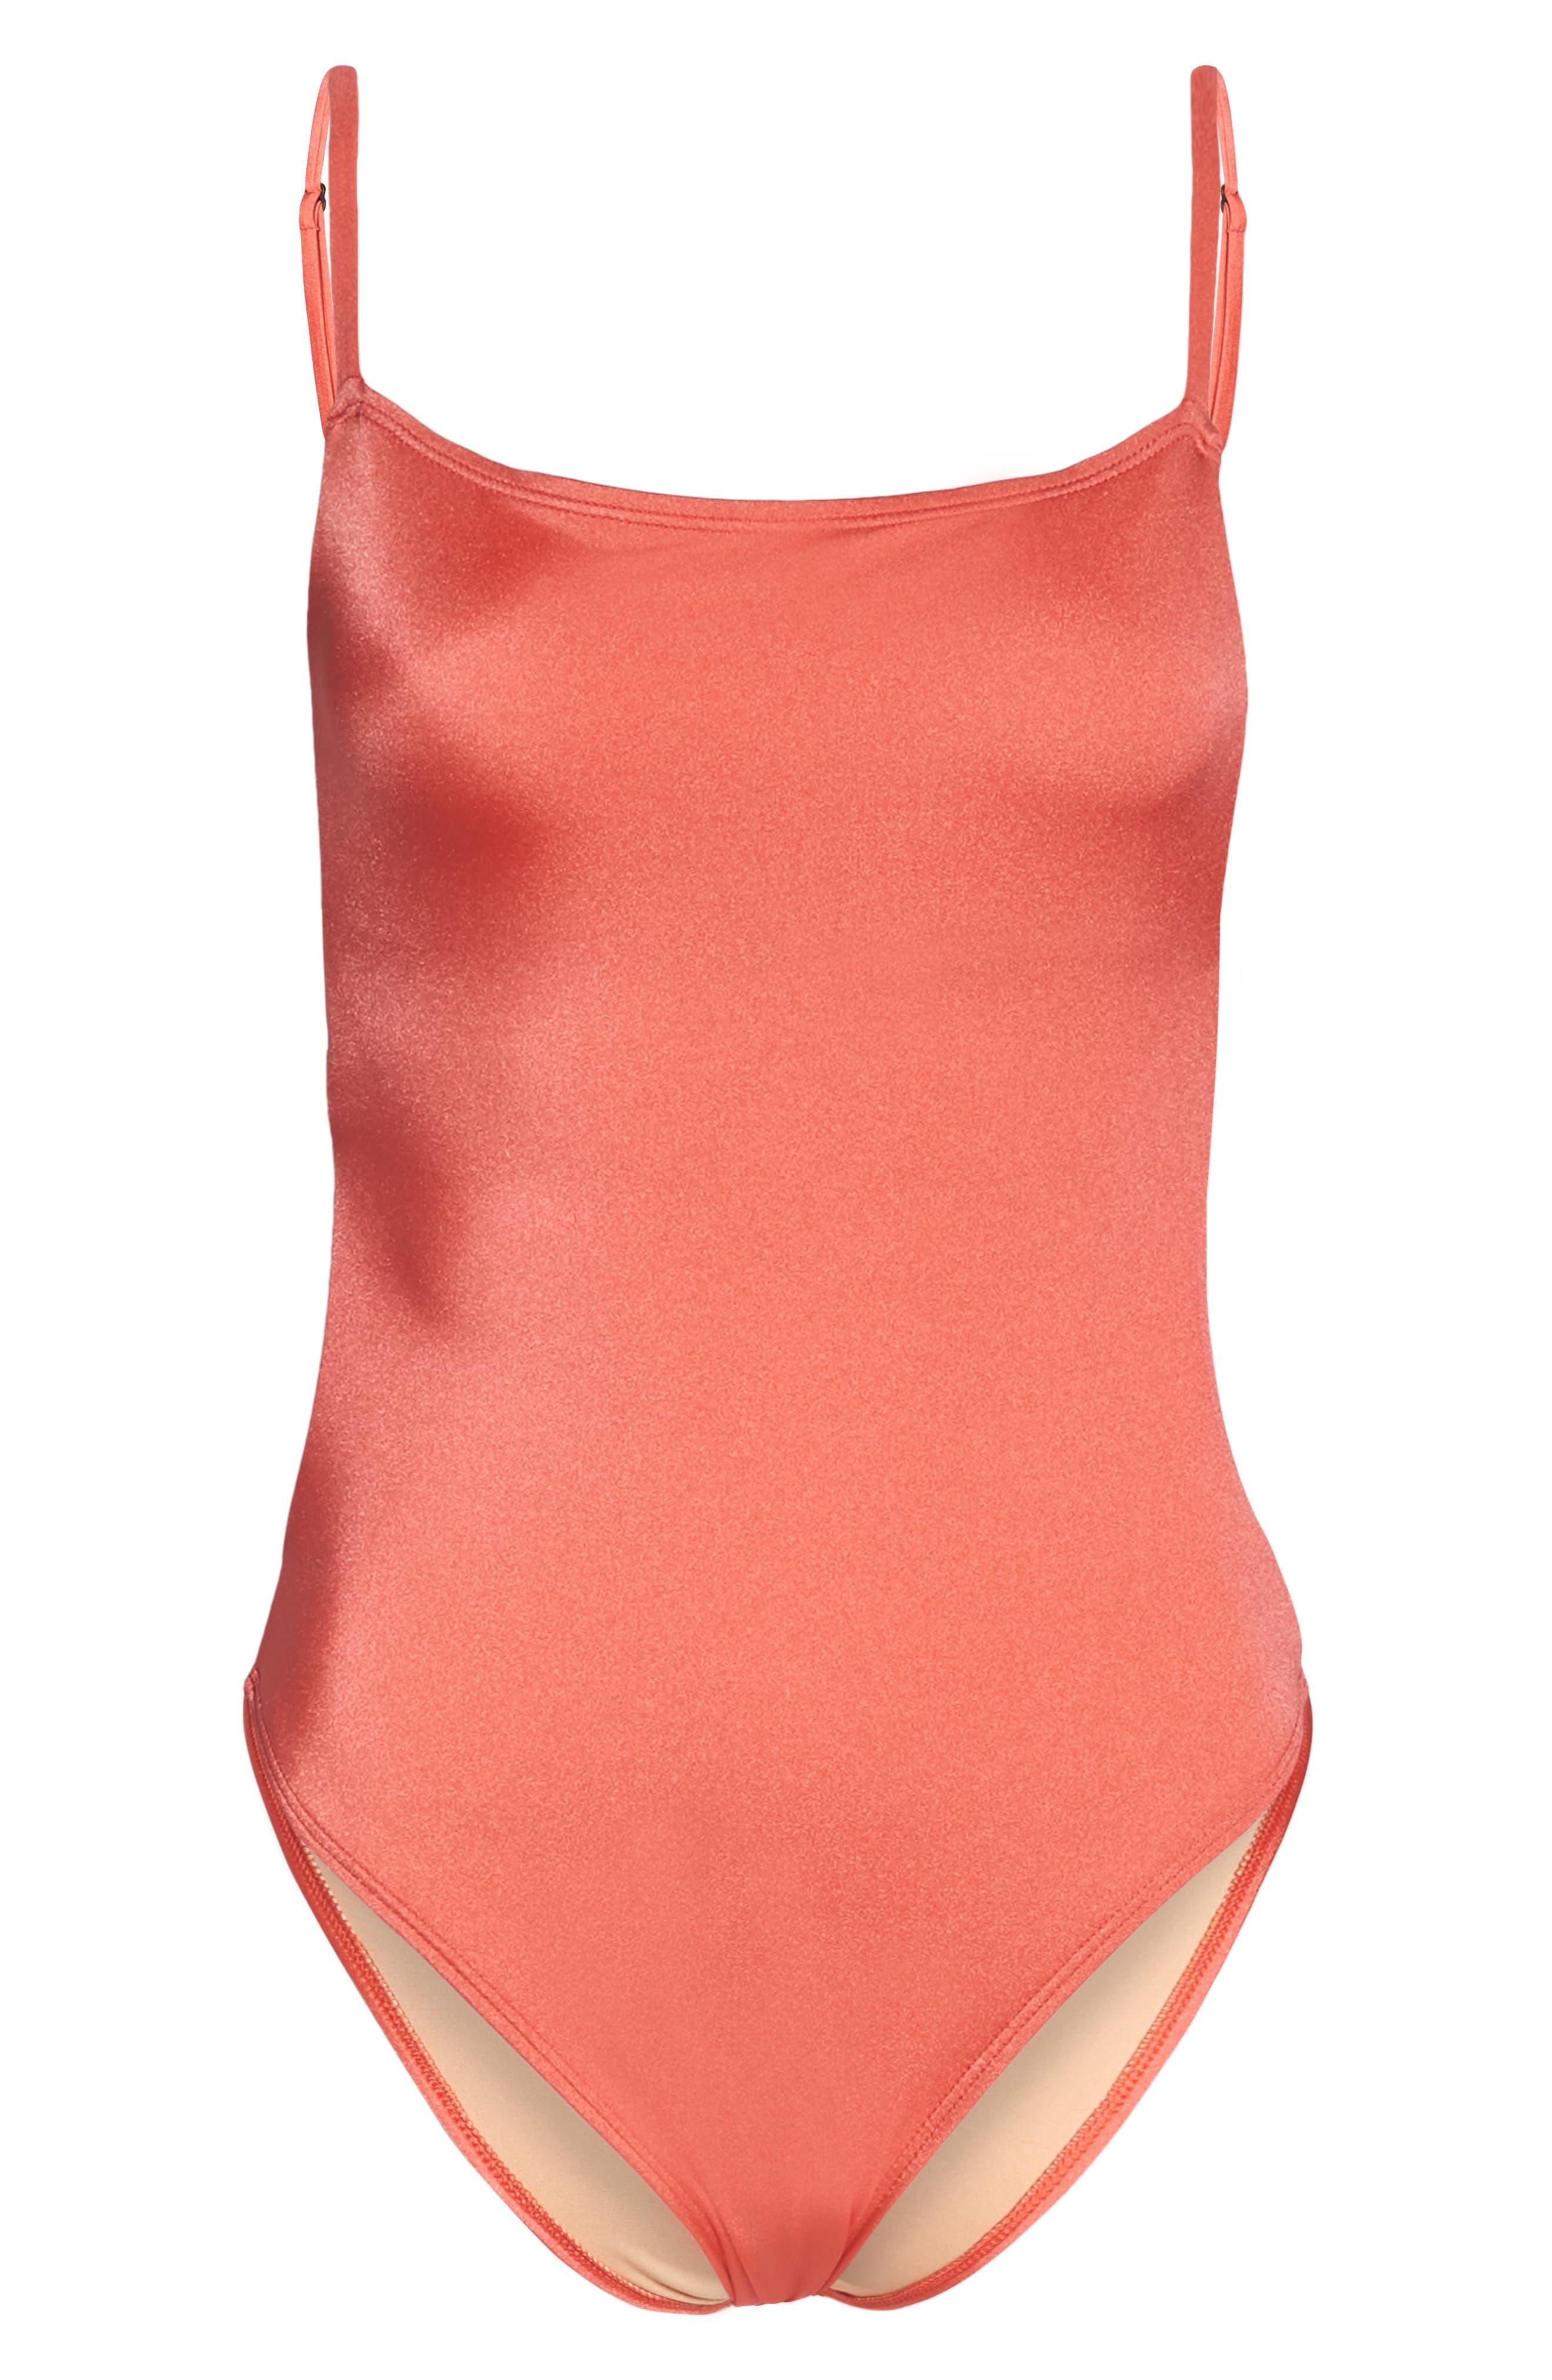 Retro One-Piece Swimsuit,                             Alternate thumbnail 6, color,                             Coral Glow